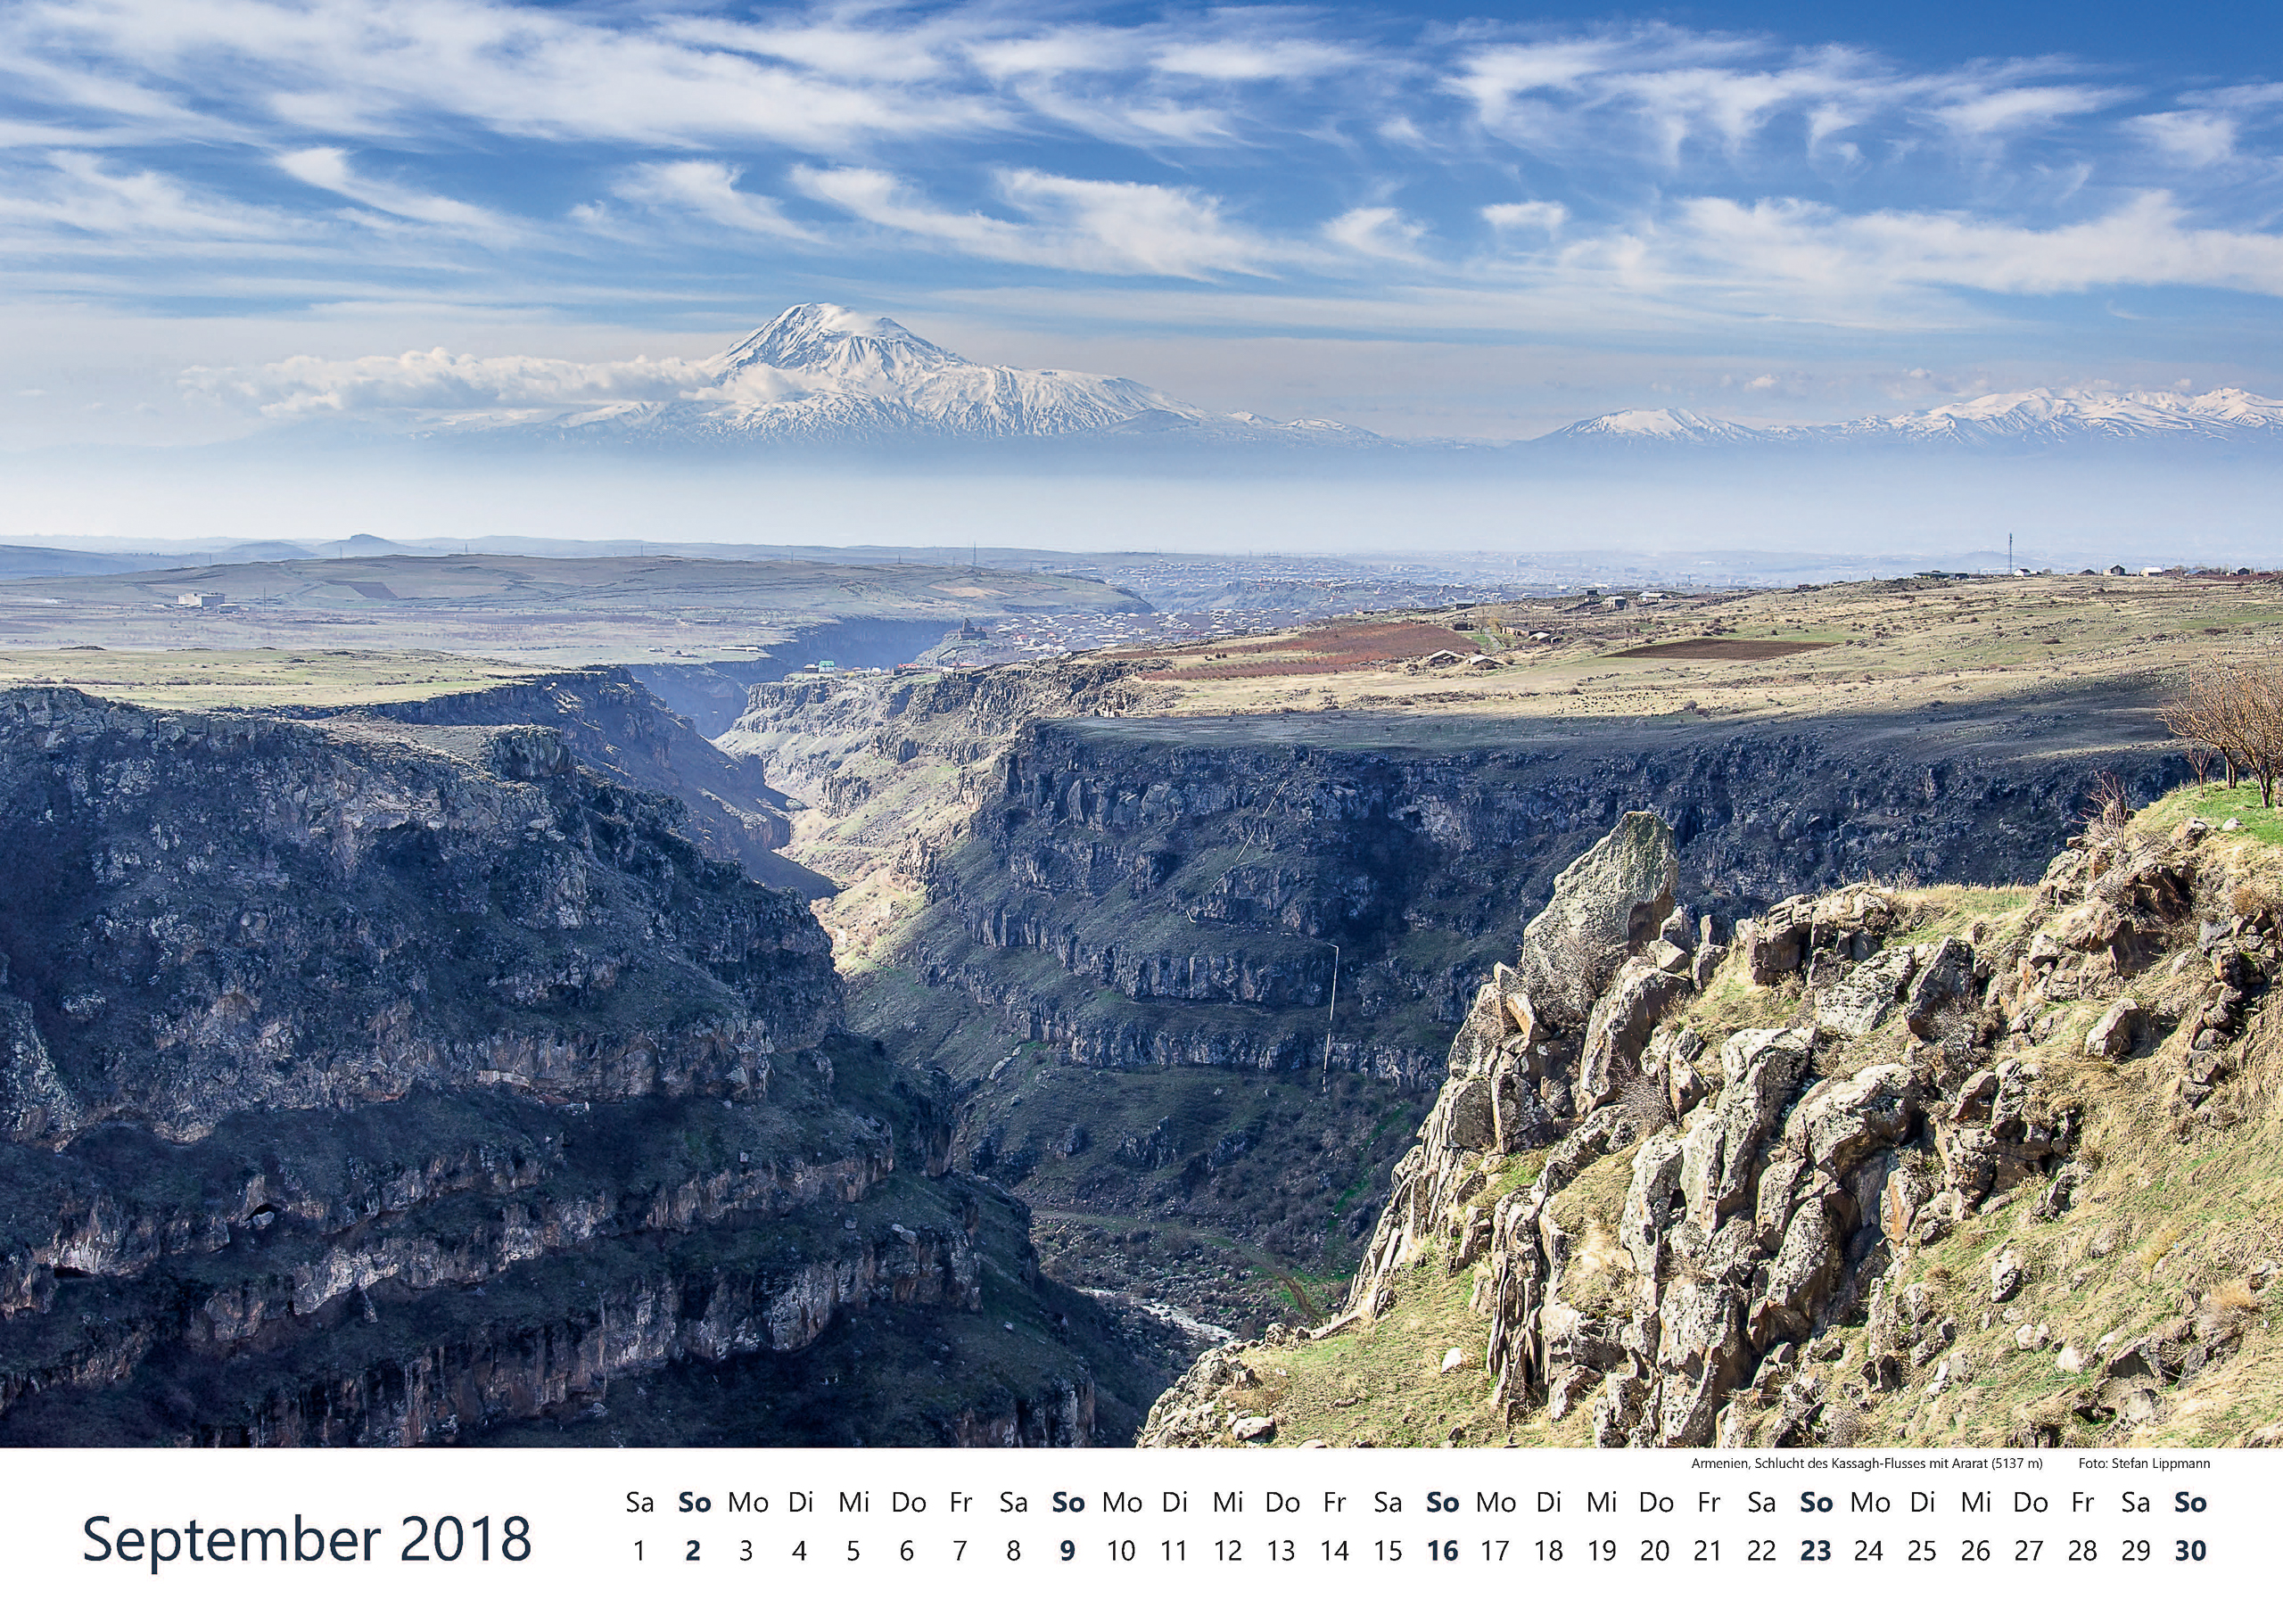 Armenien, Schlucht des Kassagh-Flusses mit Ararat (5137 m)